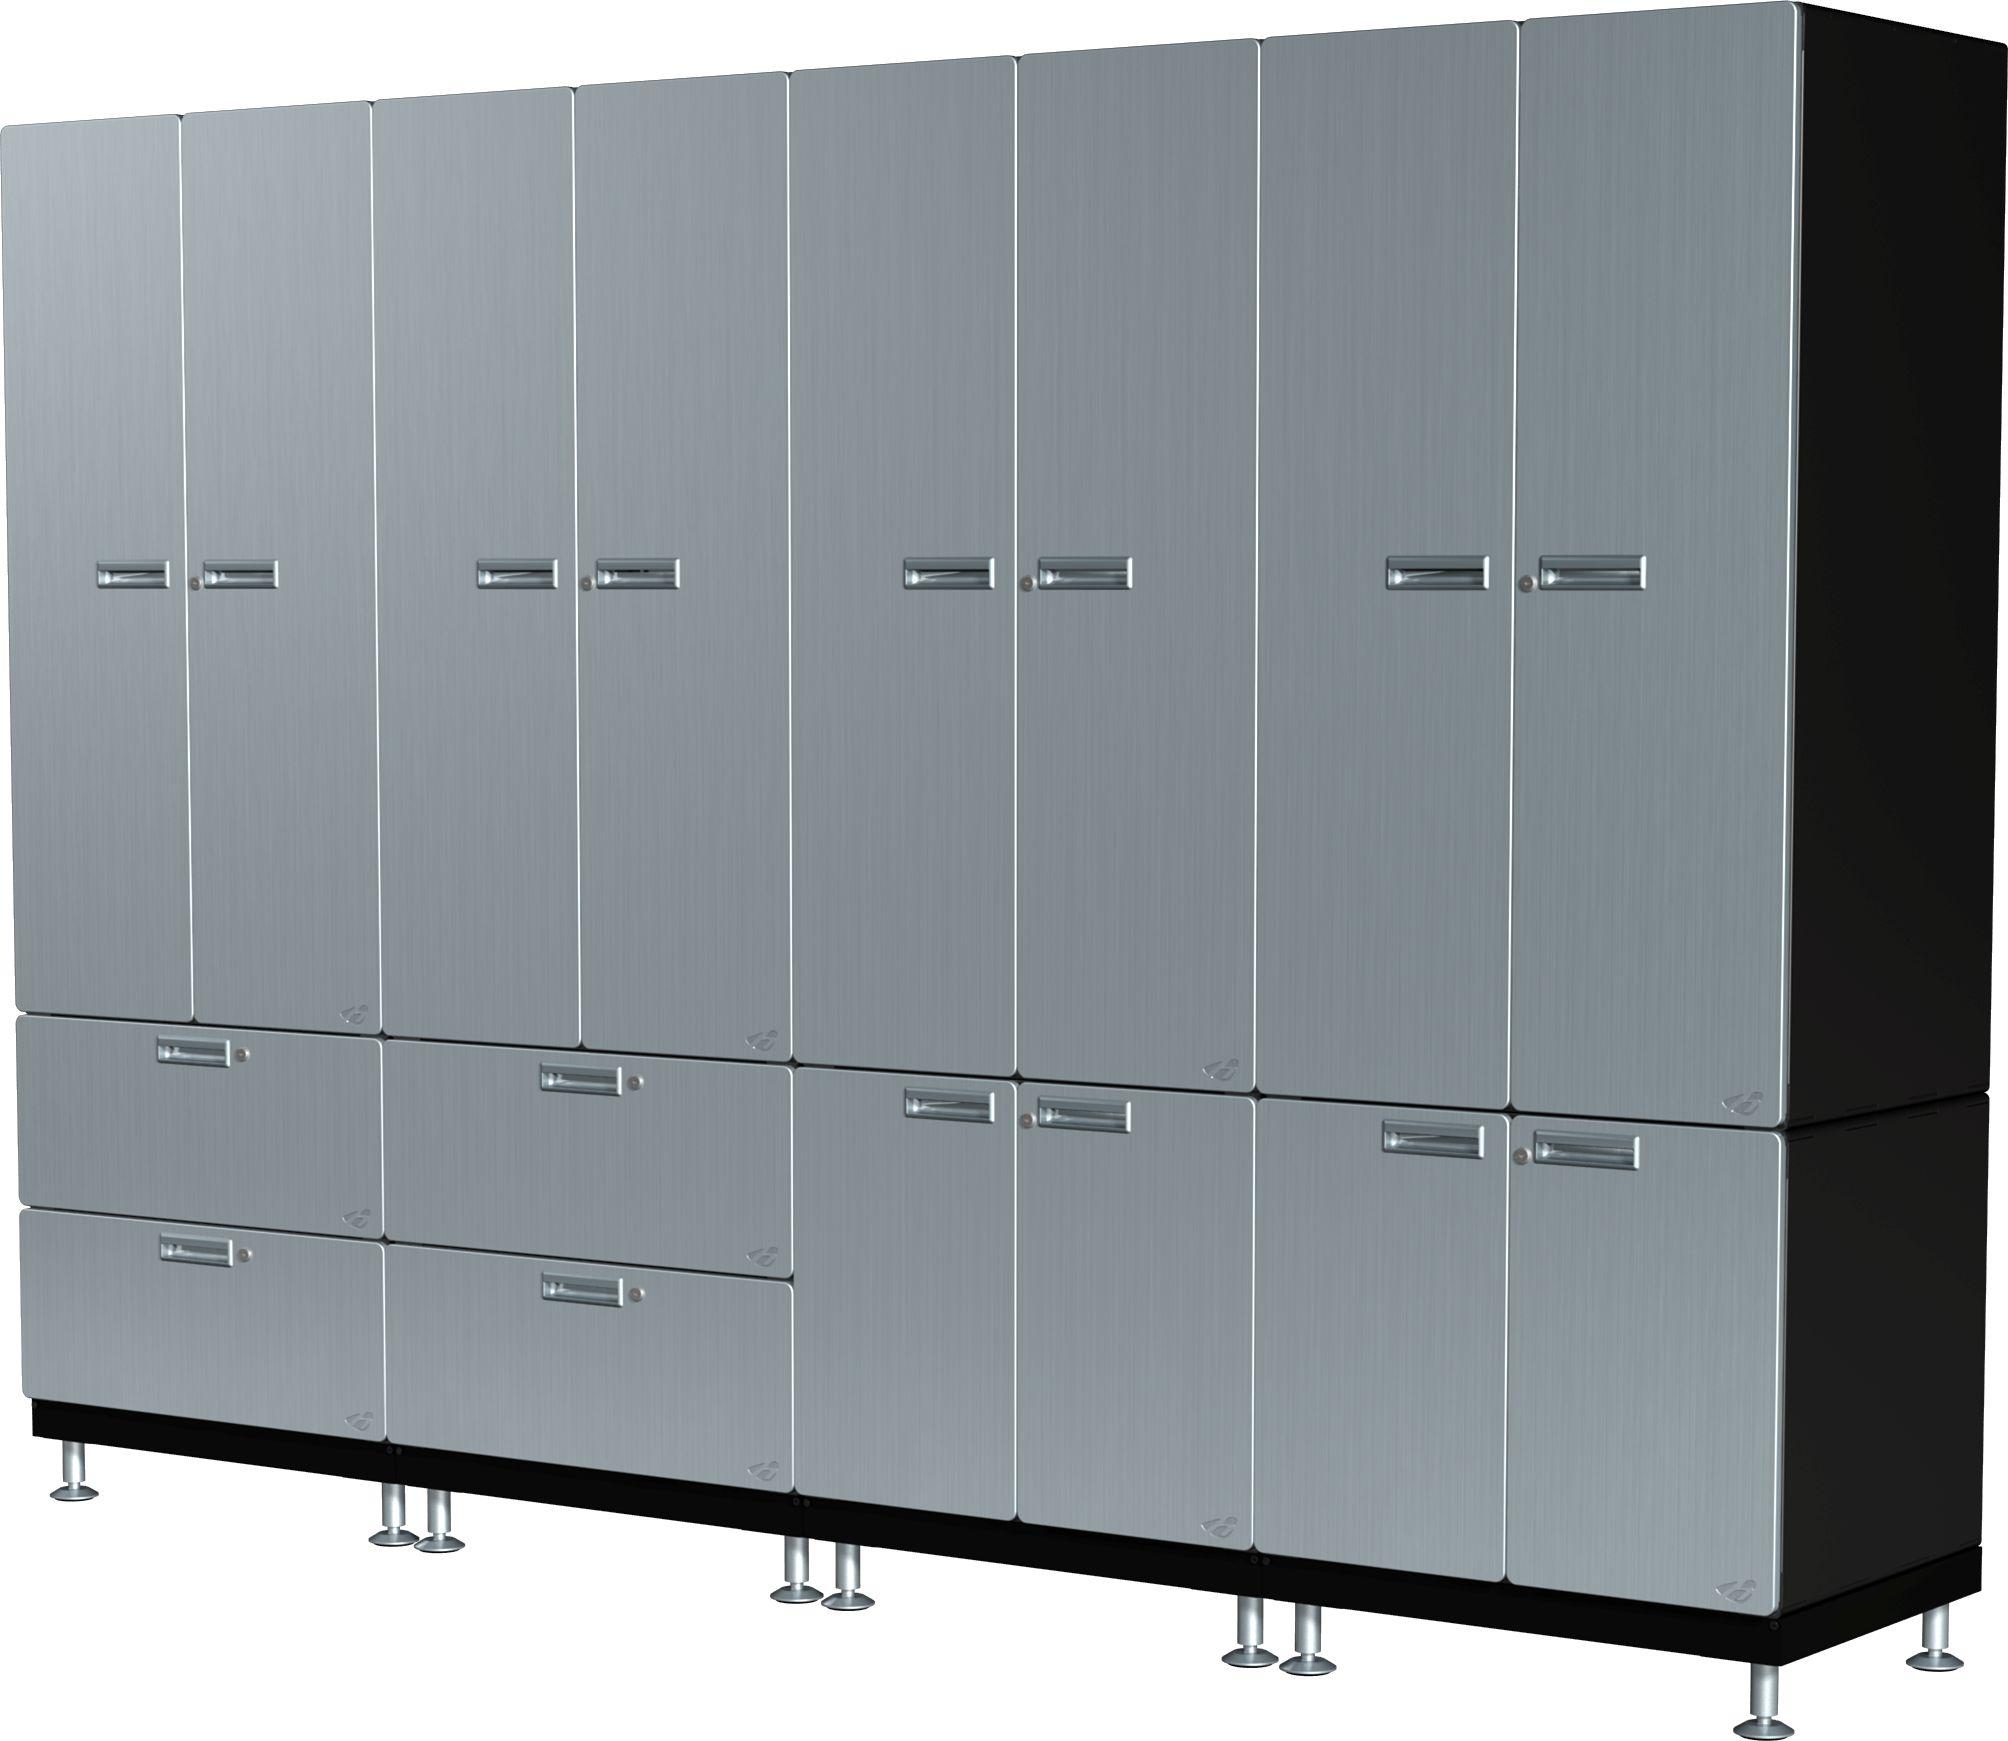 s72-storage-wall-01b.jpg